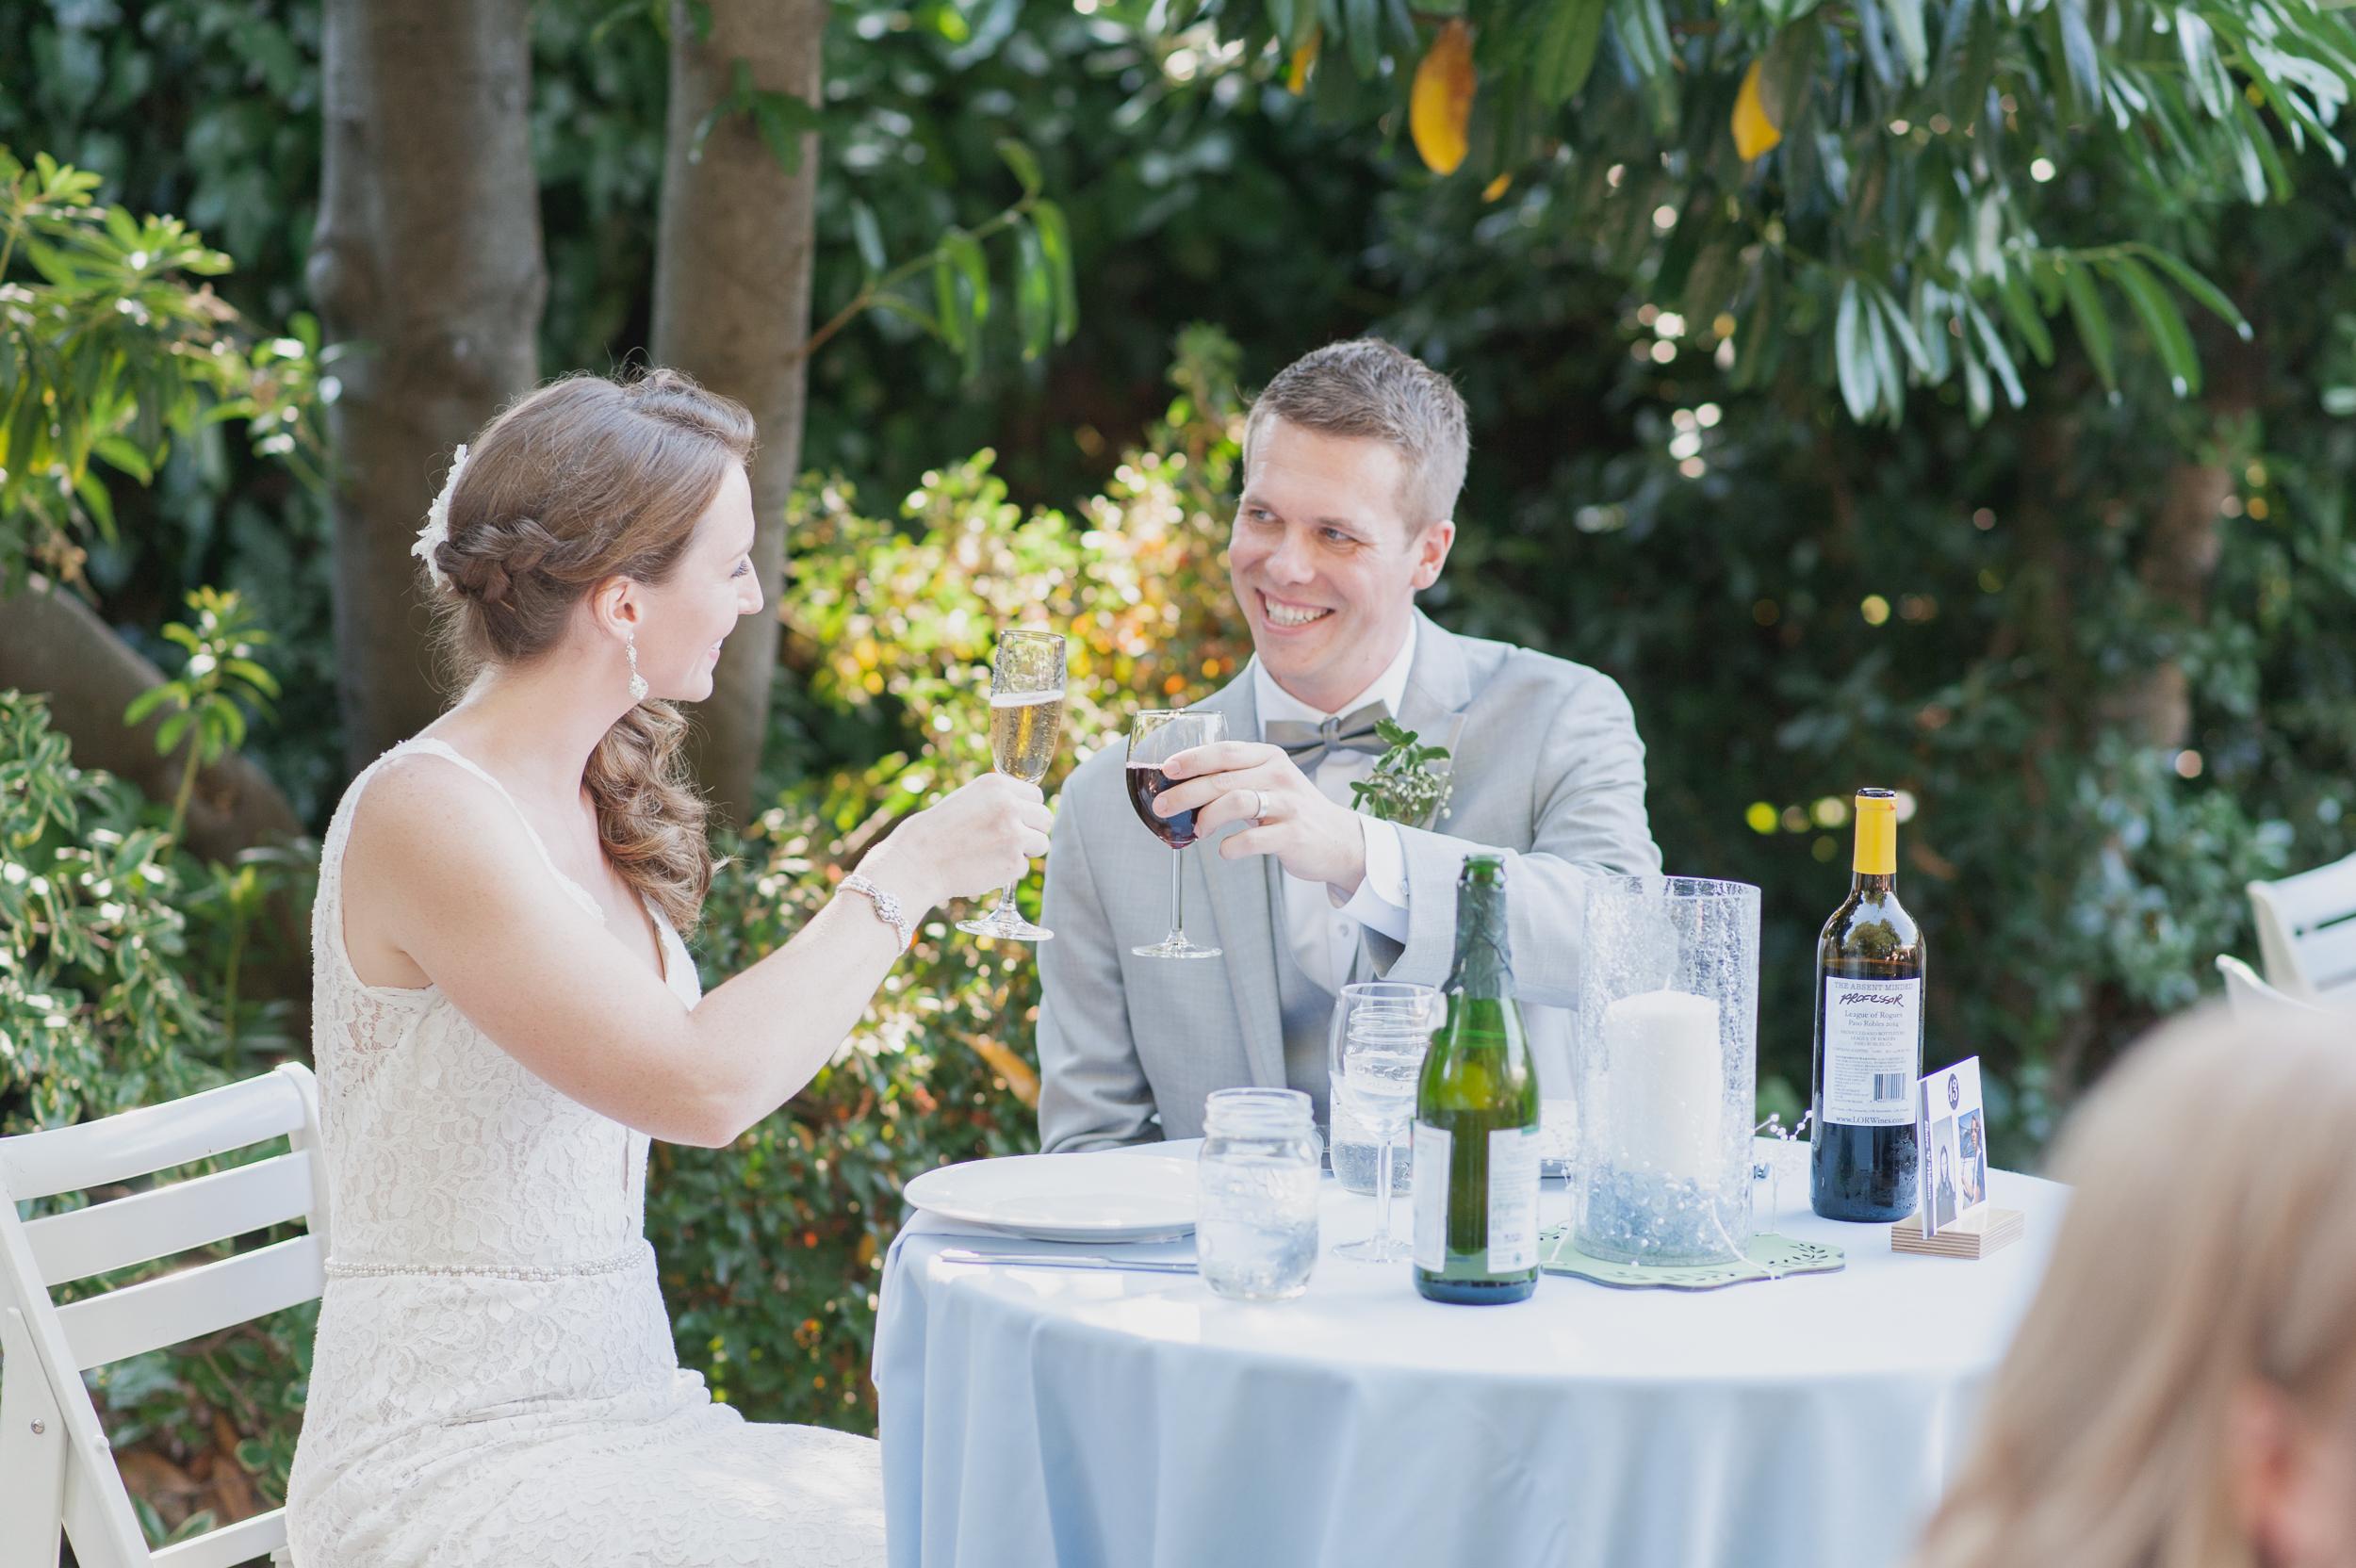 37-down-to-earth-marin-art-garden-center-wedding-vivianchen.jpg